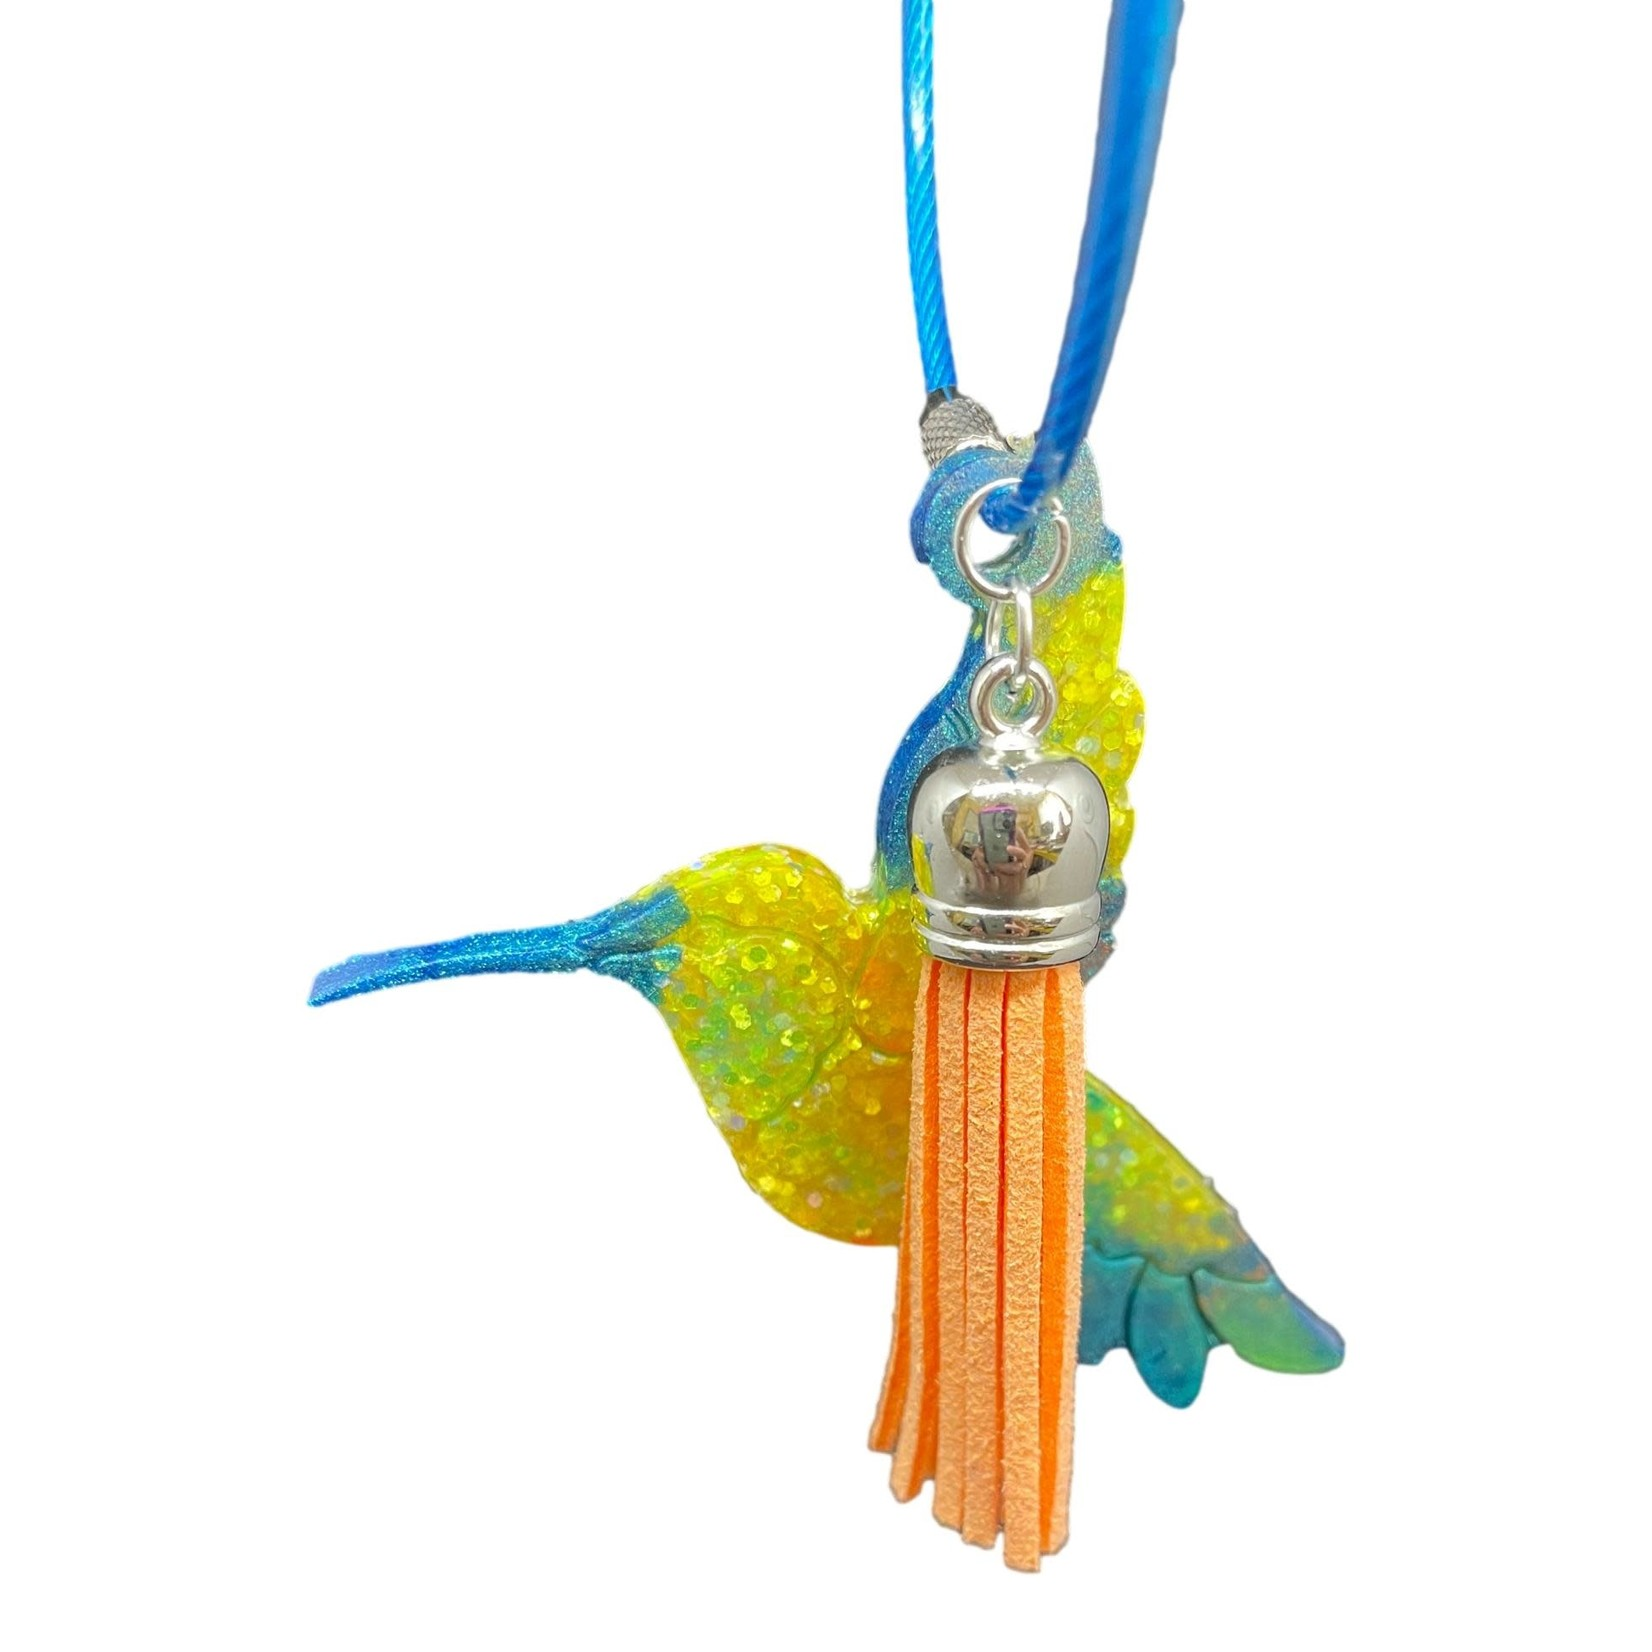 East Coast Sirens Green & Yellow Hummingbird Key Chain